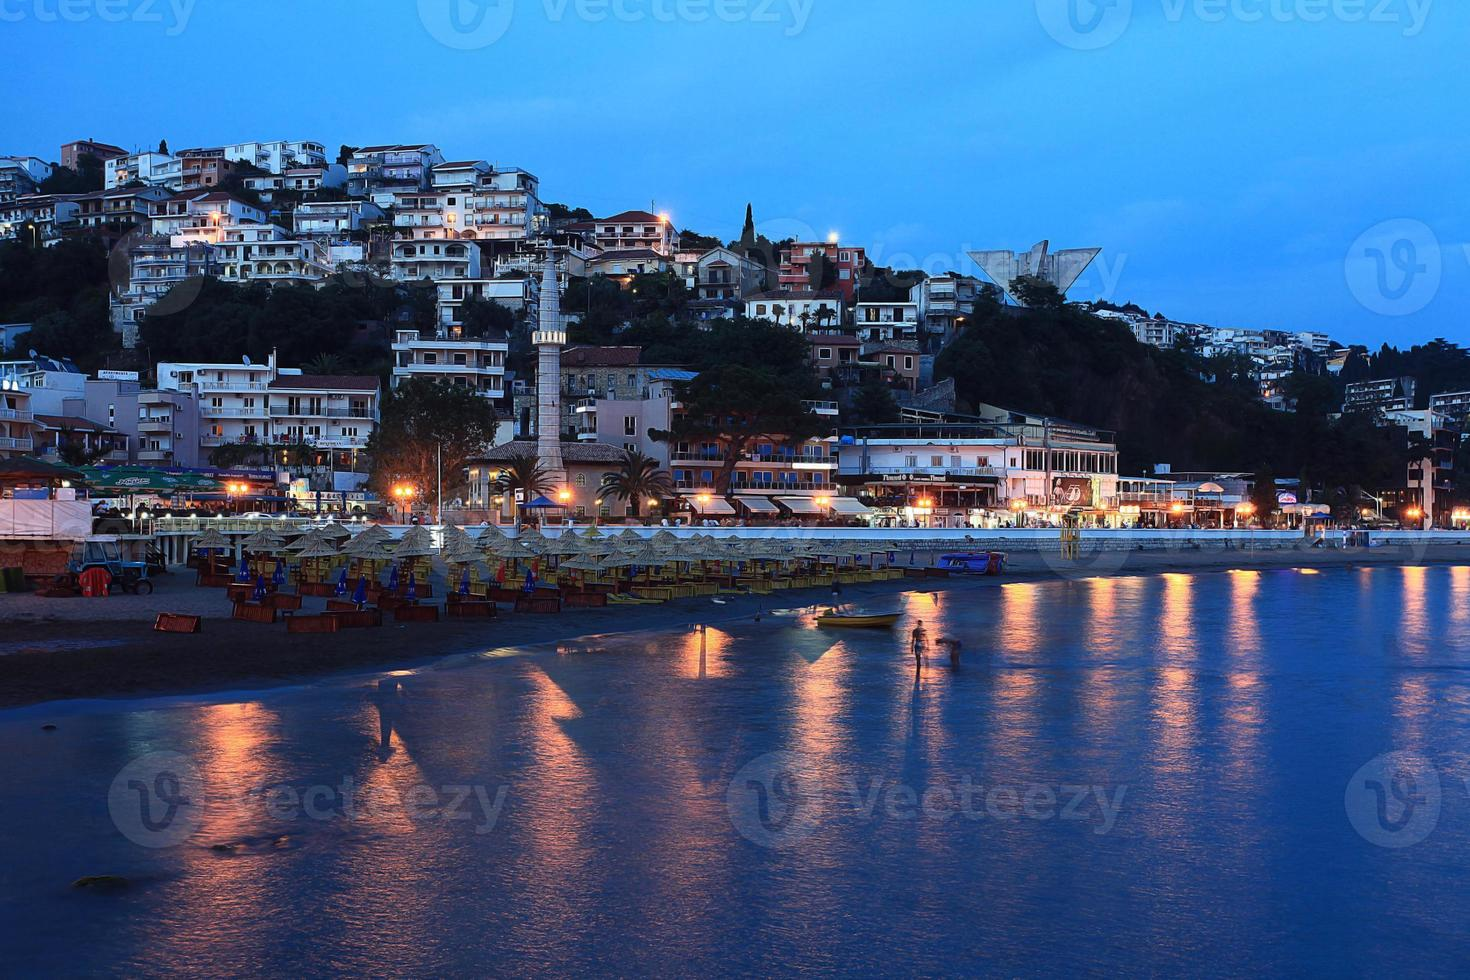 resort di paesaggio notturno in montenegro foto